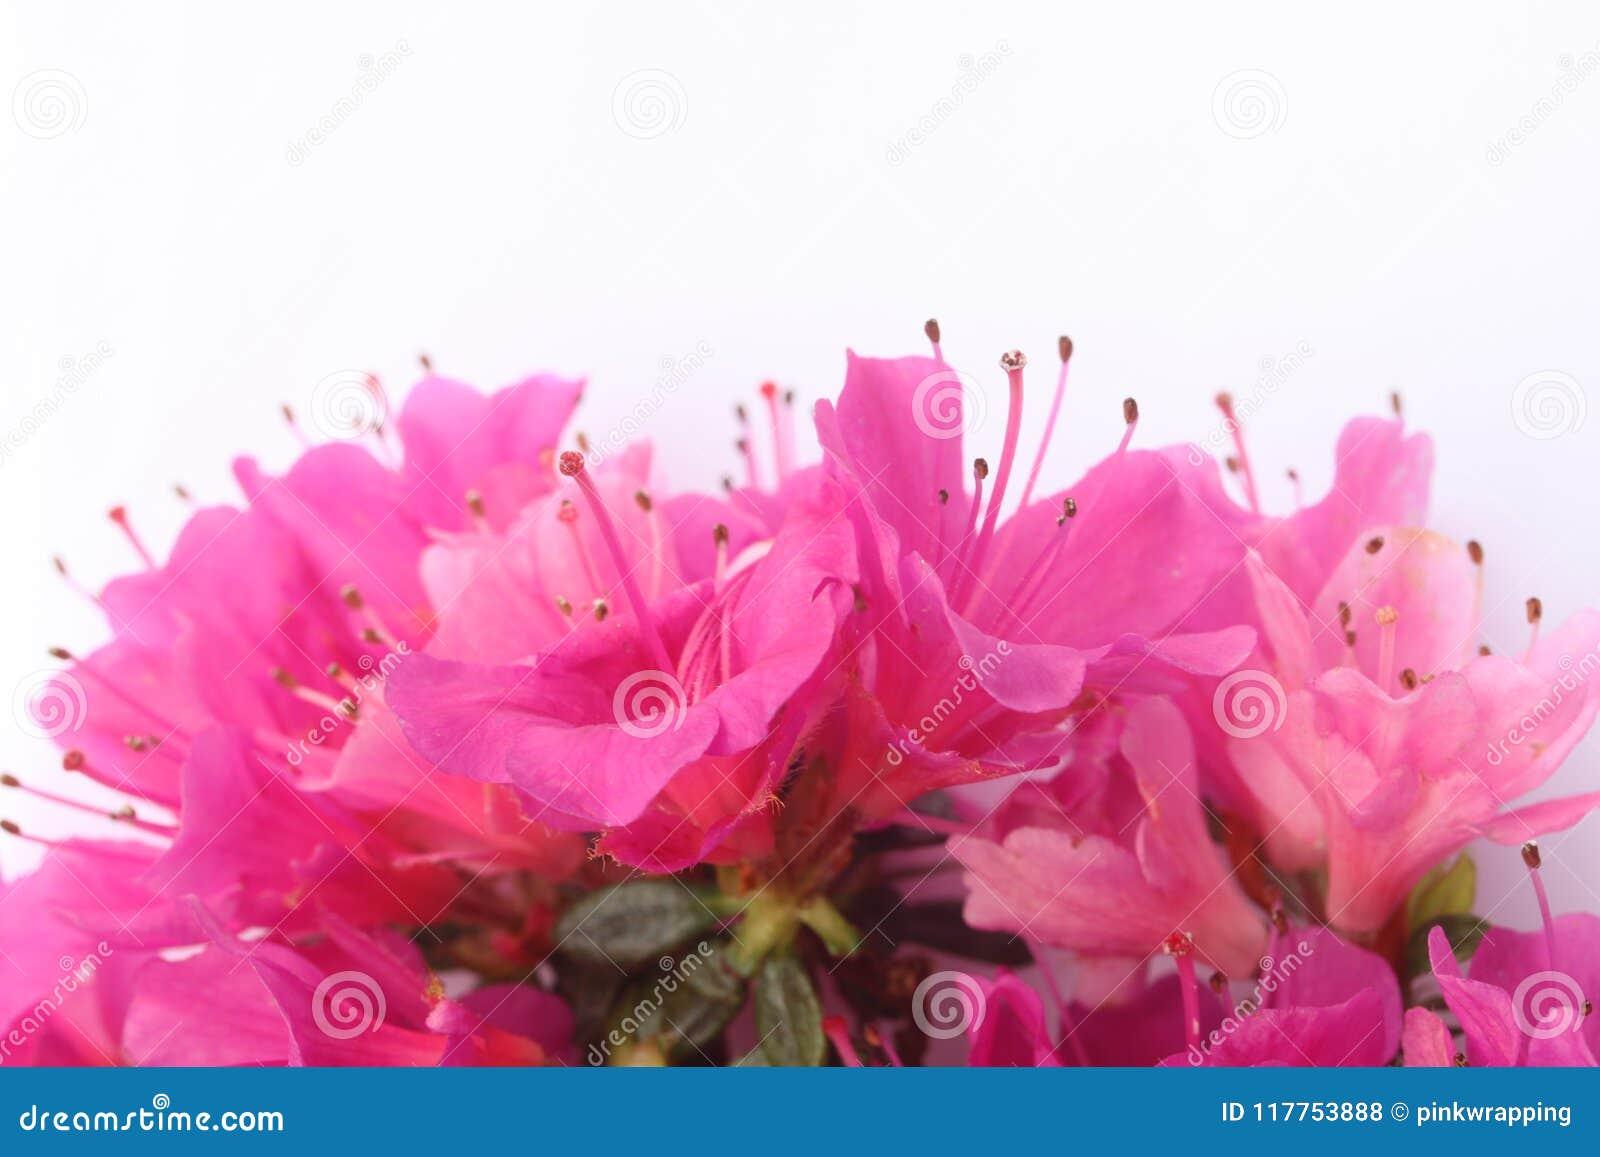 Pink Azalea Flowers Stock Photo Image Of Pink Pretty 117753888